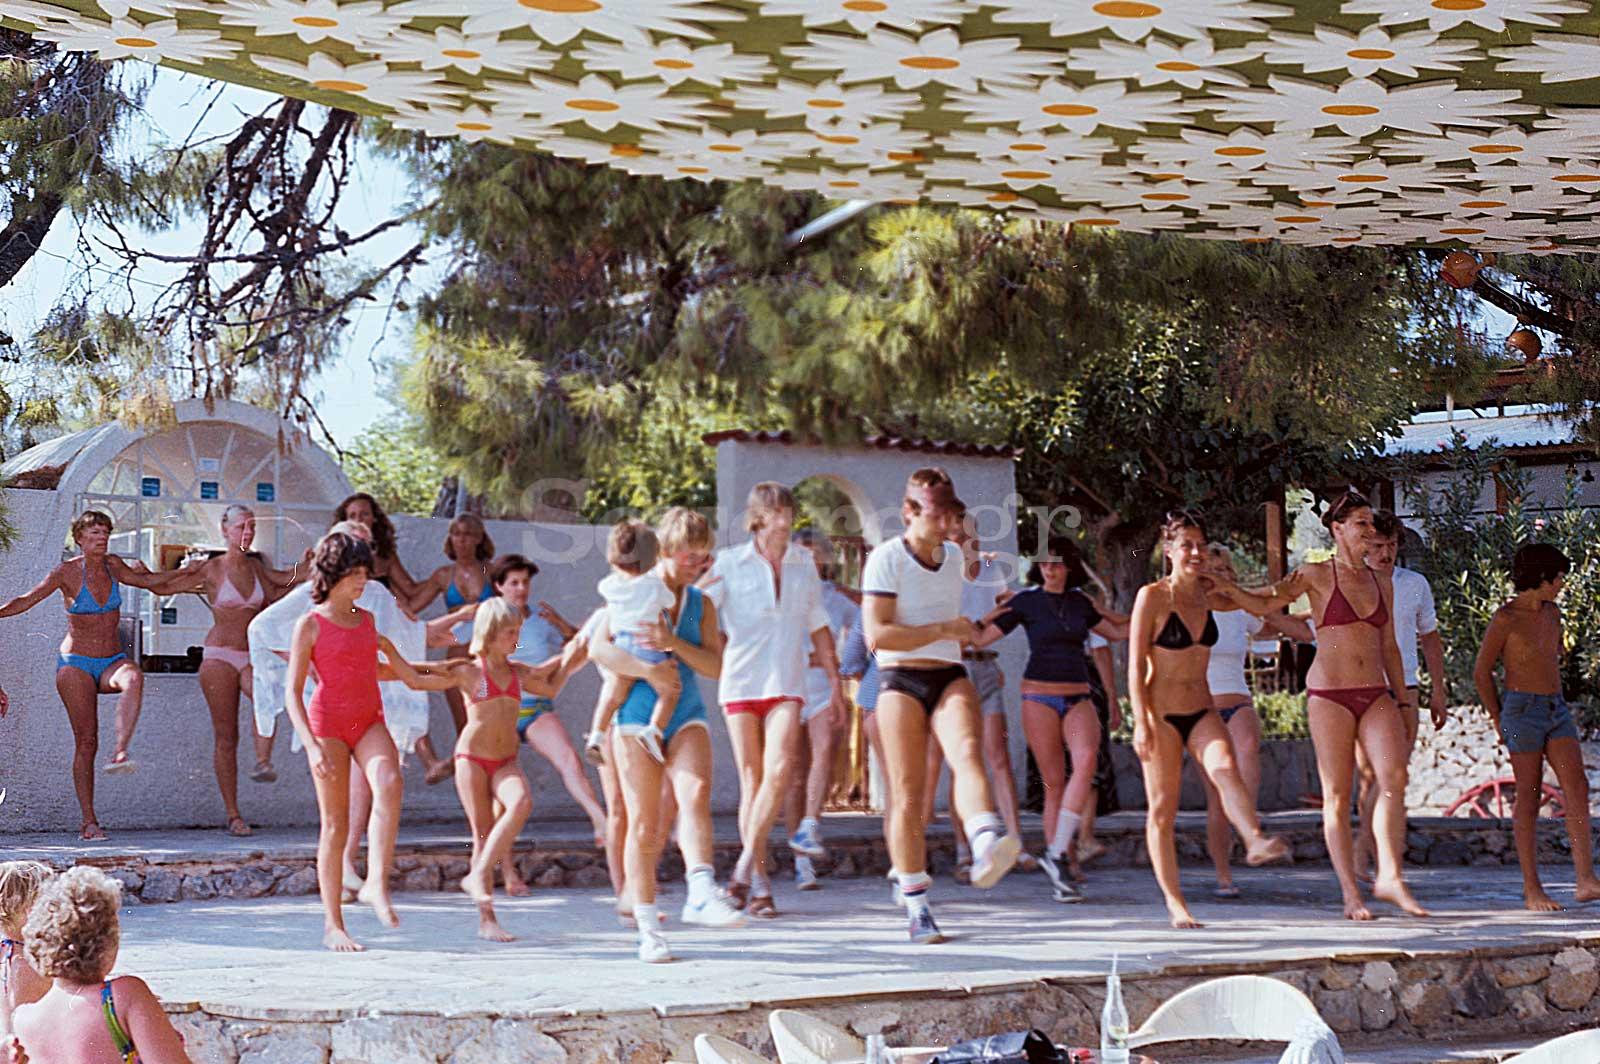 Hollidays-summer-84-2